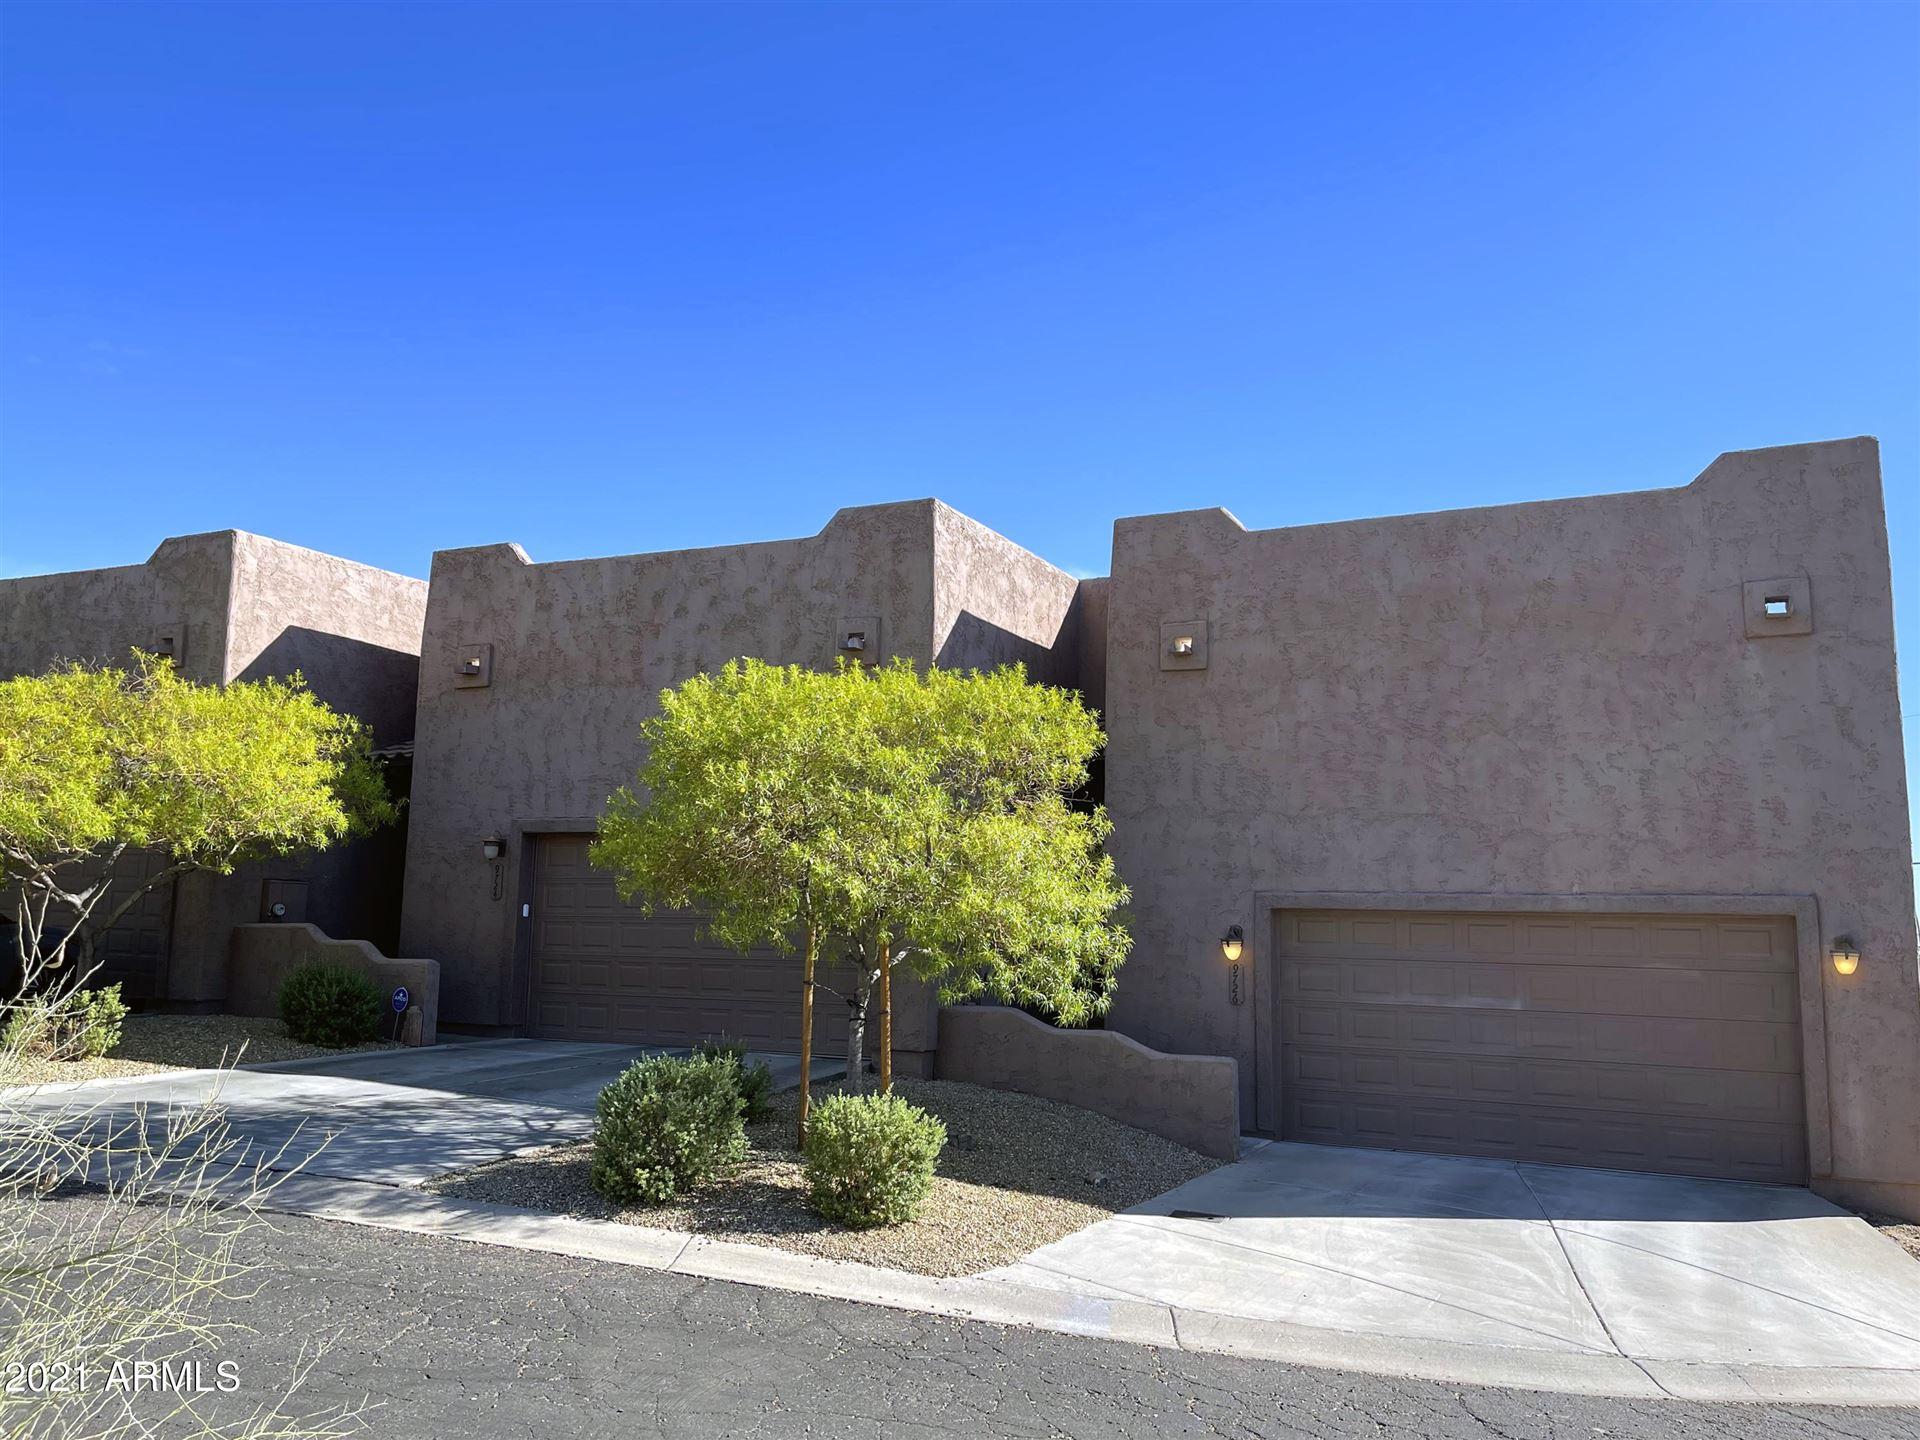 9726 N 3RD Drive, Phoenix, AZ 85021 - MLS#: 6245443